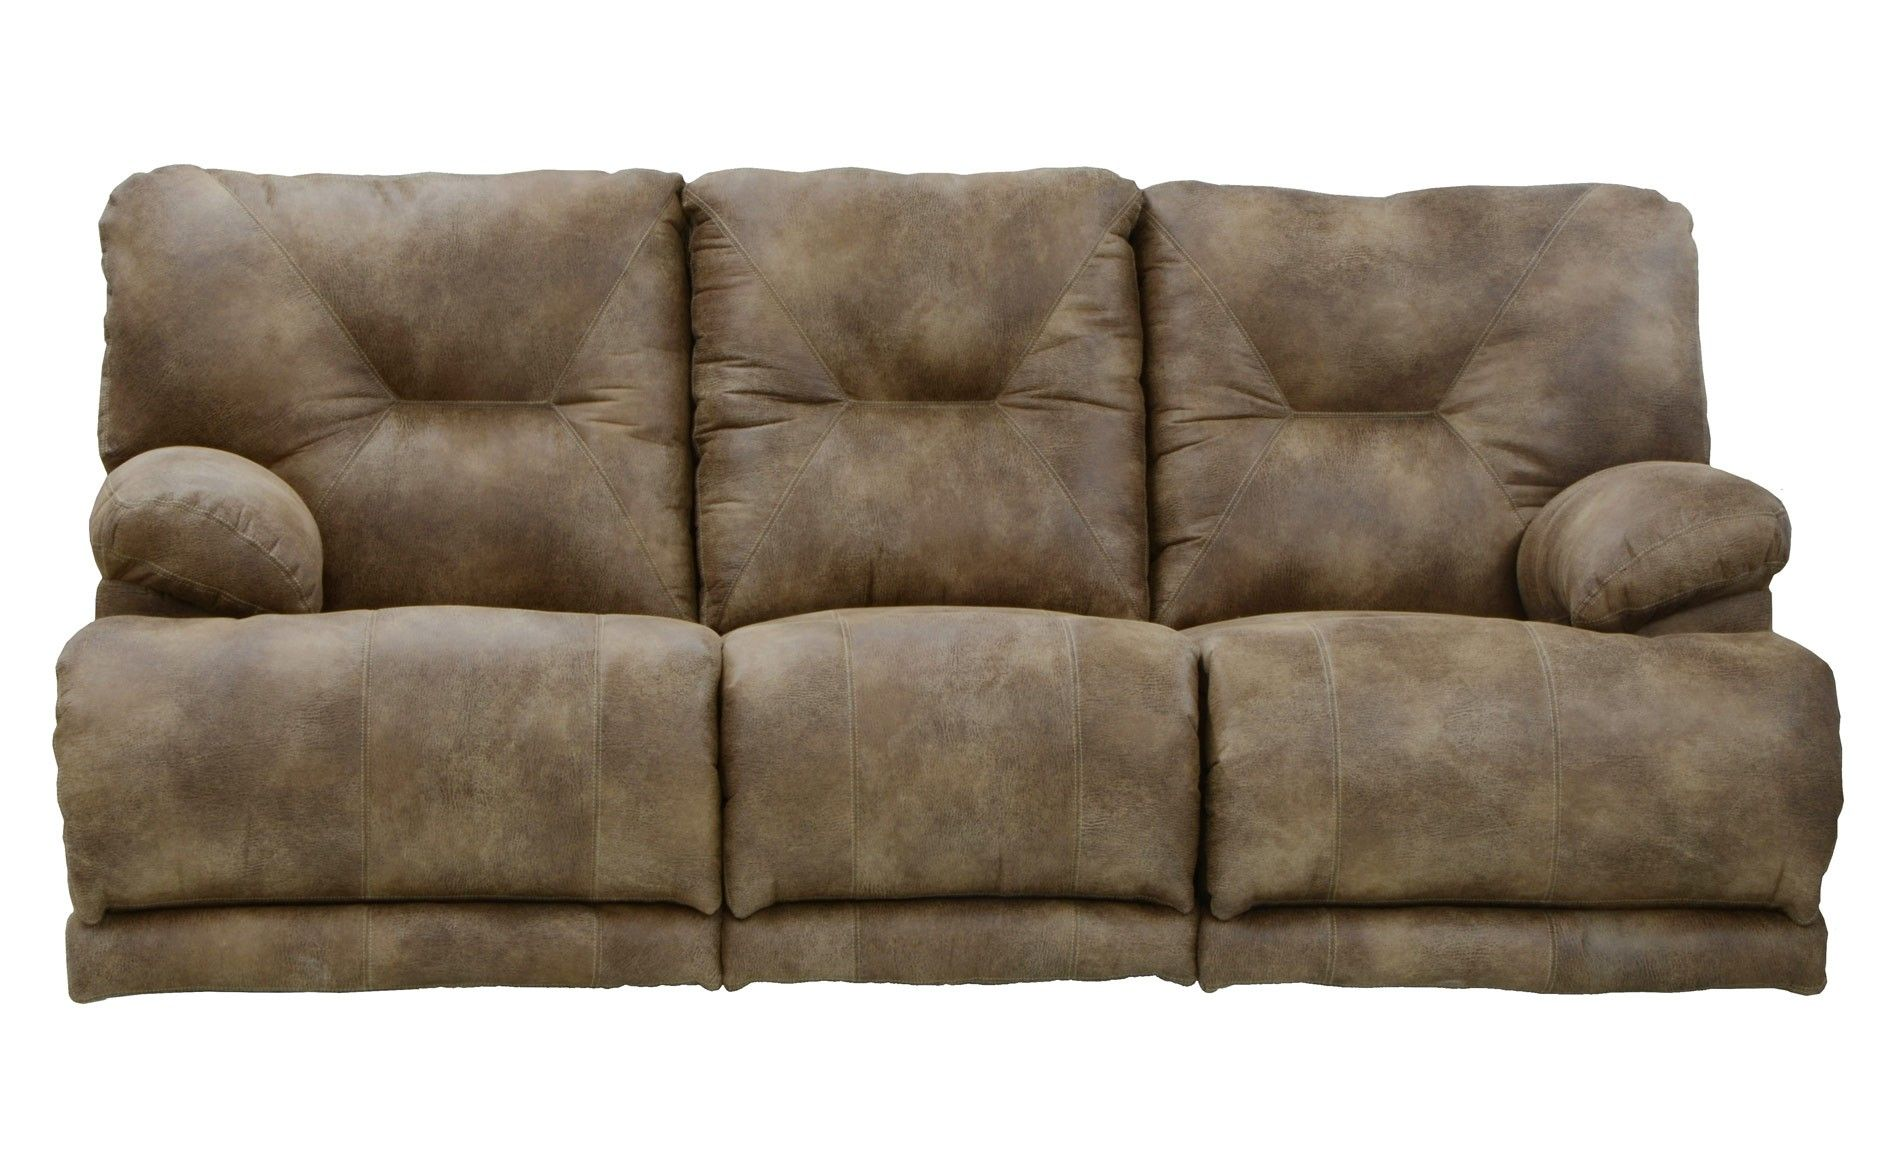 Triple Reclining Sofa House Of Fraser Linea Laine Montana Lay Flat W Drop Down Table